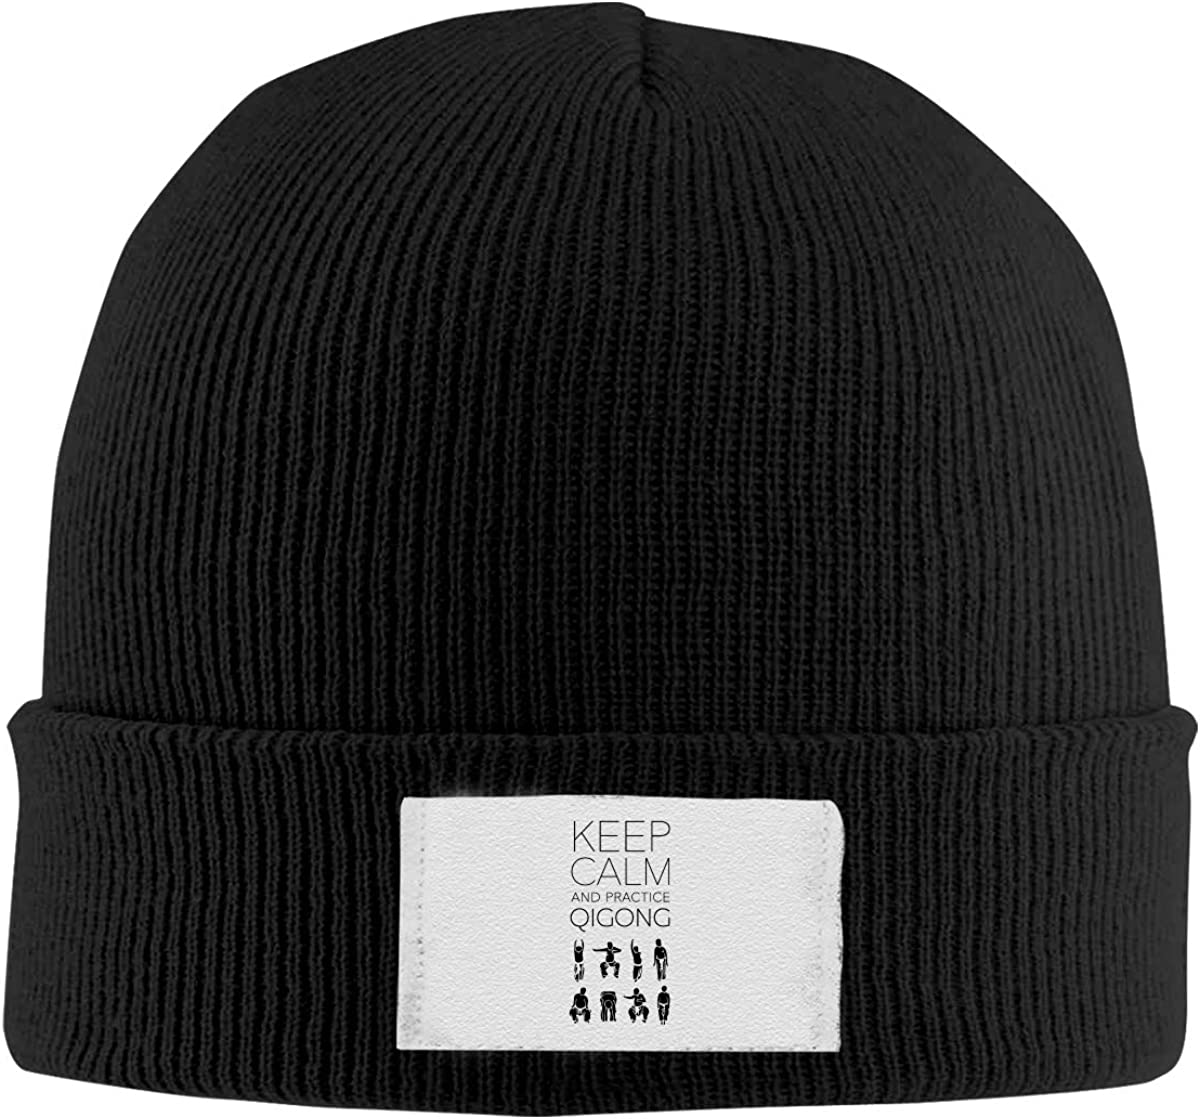 RZMdSG Keep Calm and Practice Qigong Kongfu Unisex Winter Printed Warm Knitting Hats Skull Cap